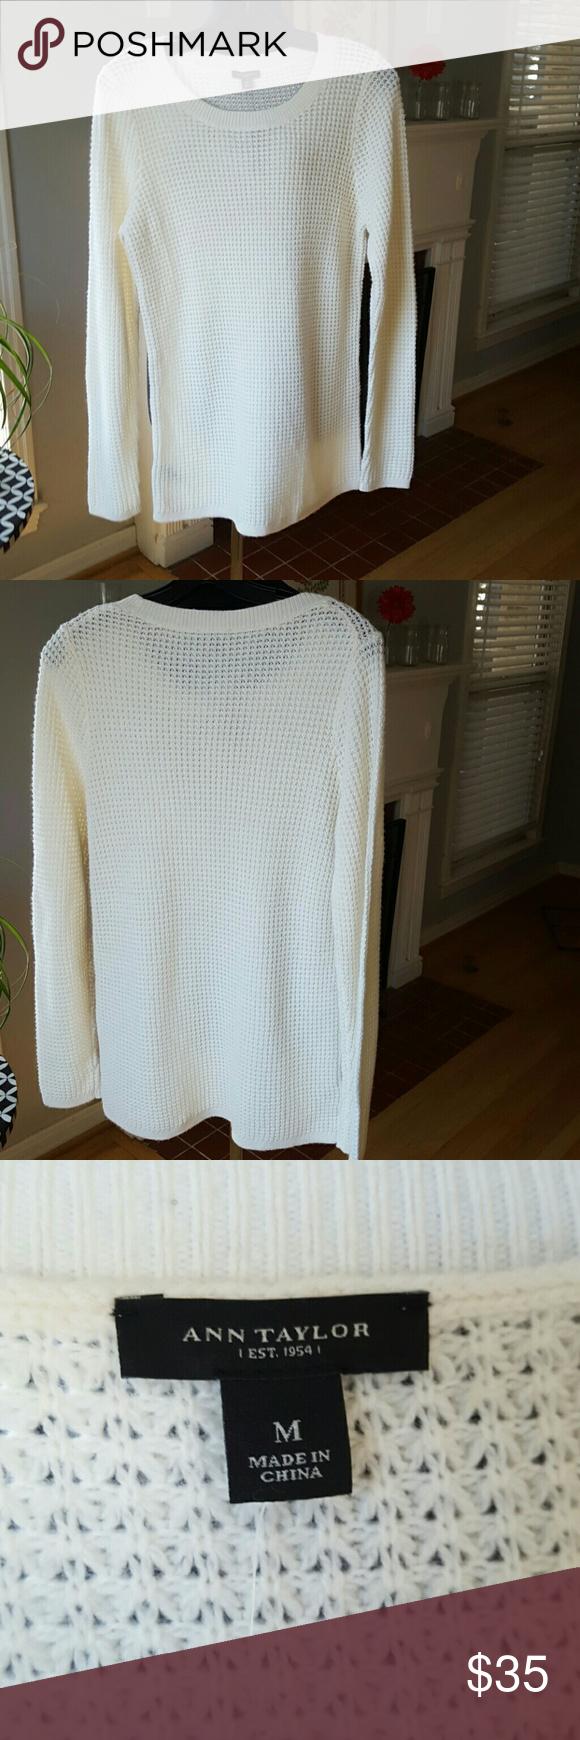 Selling this Ann Taylor Sweater, NWT on Poshmark! My username is: bettyecloset. #shopmycloset #poshmark #fashion #shopping #style #forsale #Ann Taylor #Sweaters